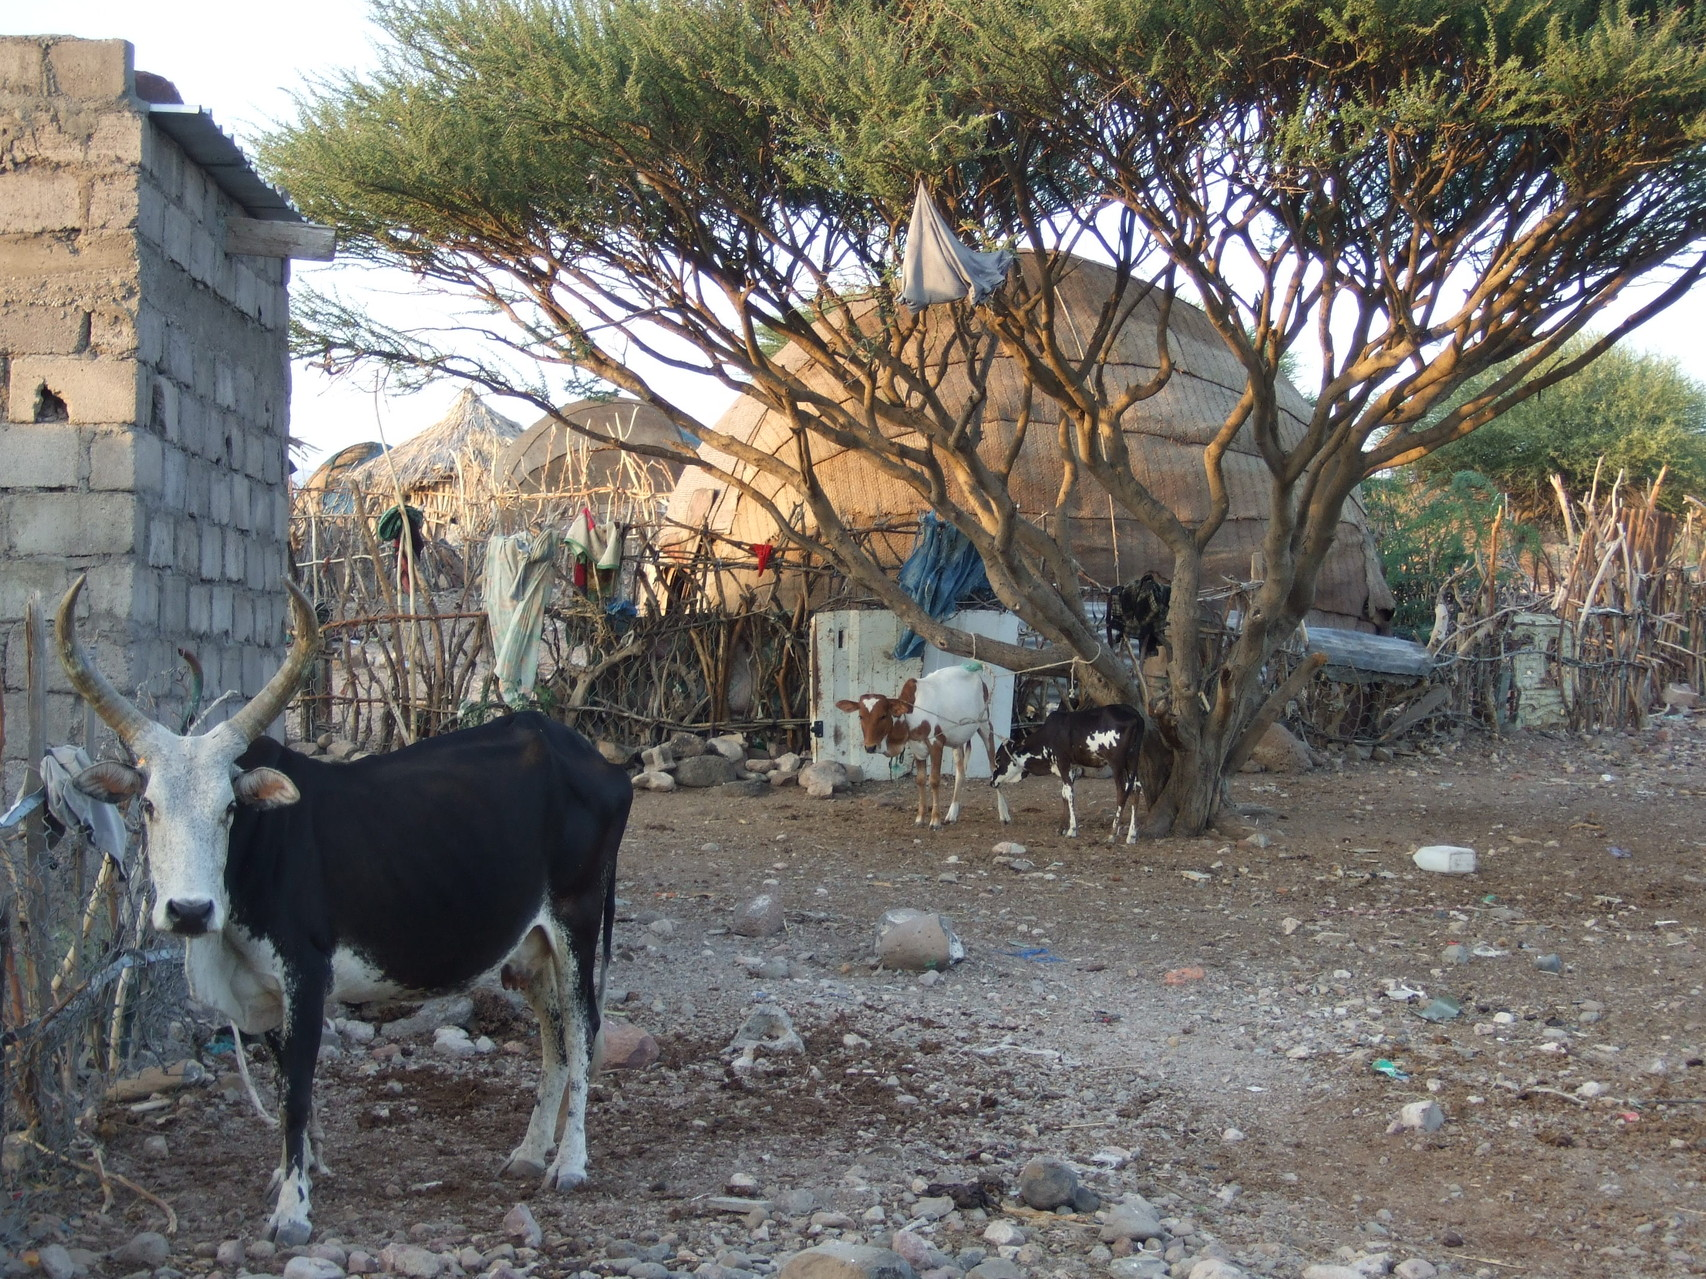 A Ambabo-Kalaf, une daboïta : habitat traditionnel des Afars